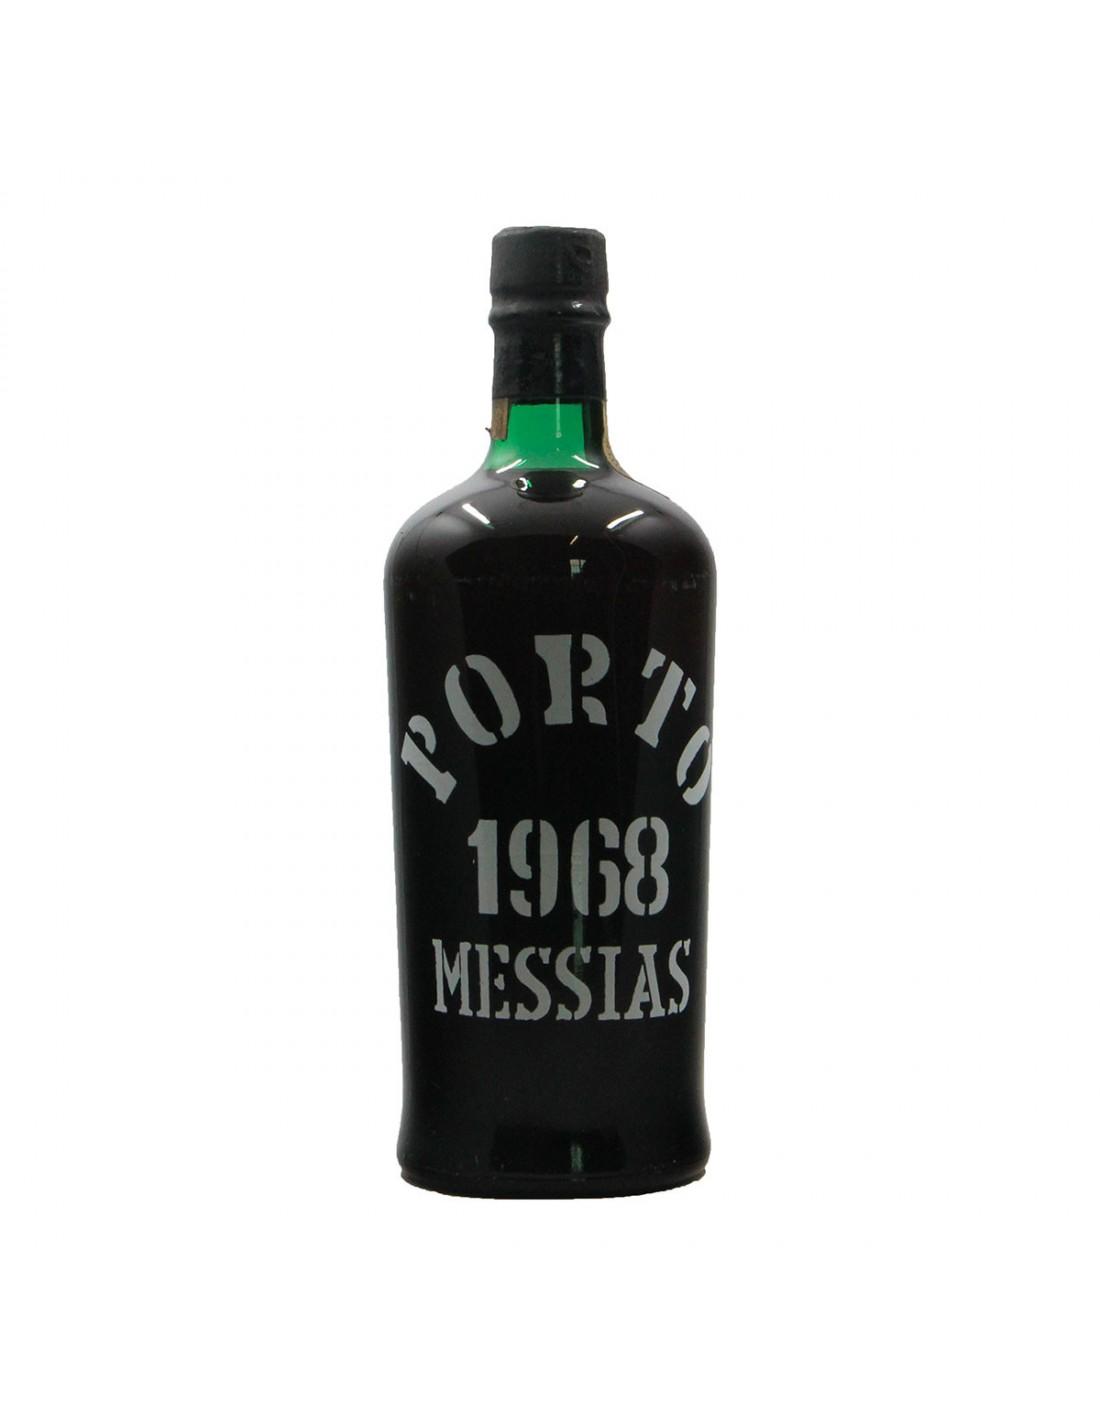 PORTO MESSIAS 1968 MESSIAS Grandi Bottiglie